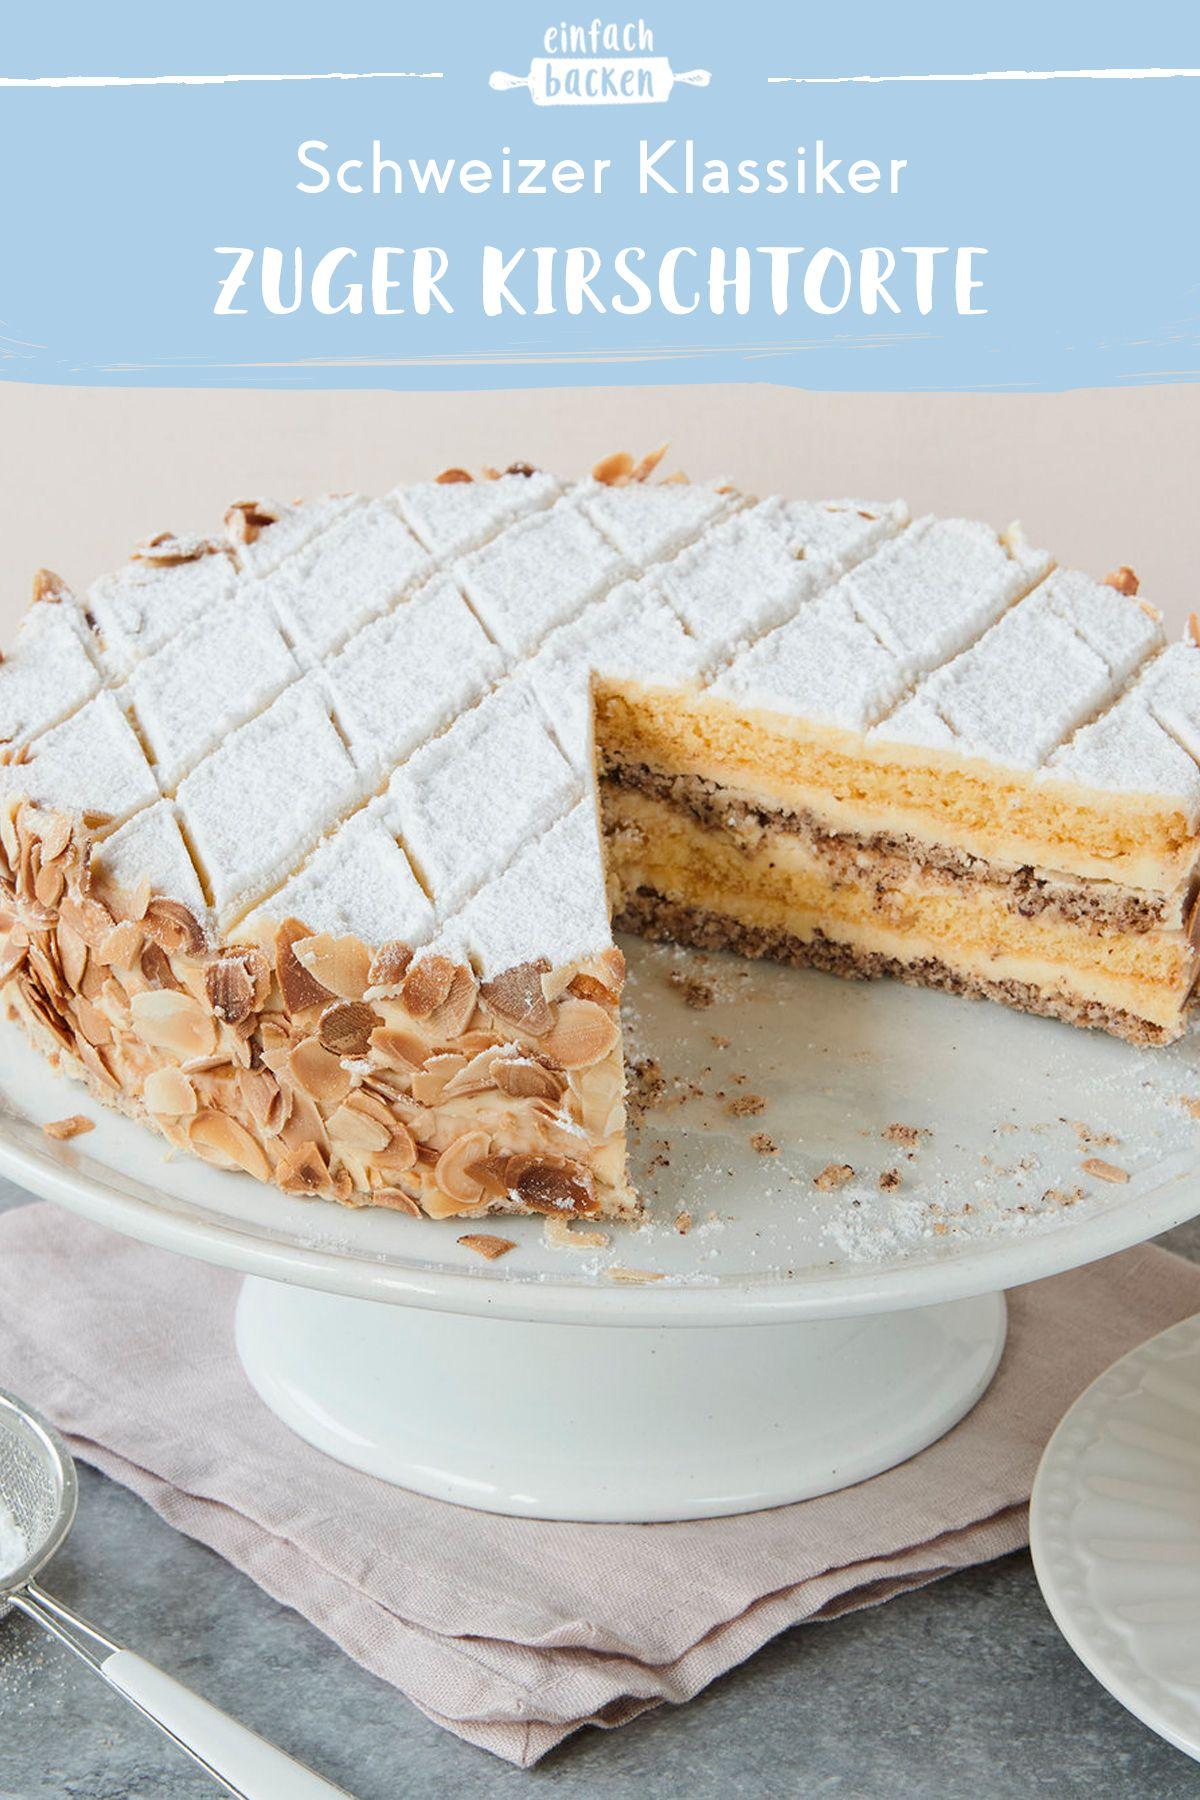 4199469c8be2ba5bee0595a4004da39f - Torten Rezepte Einfach Und Lecker